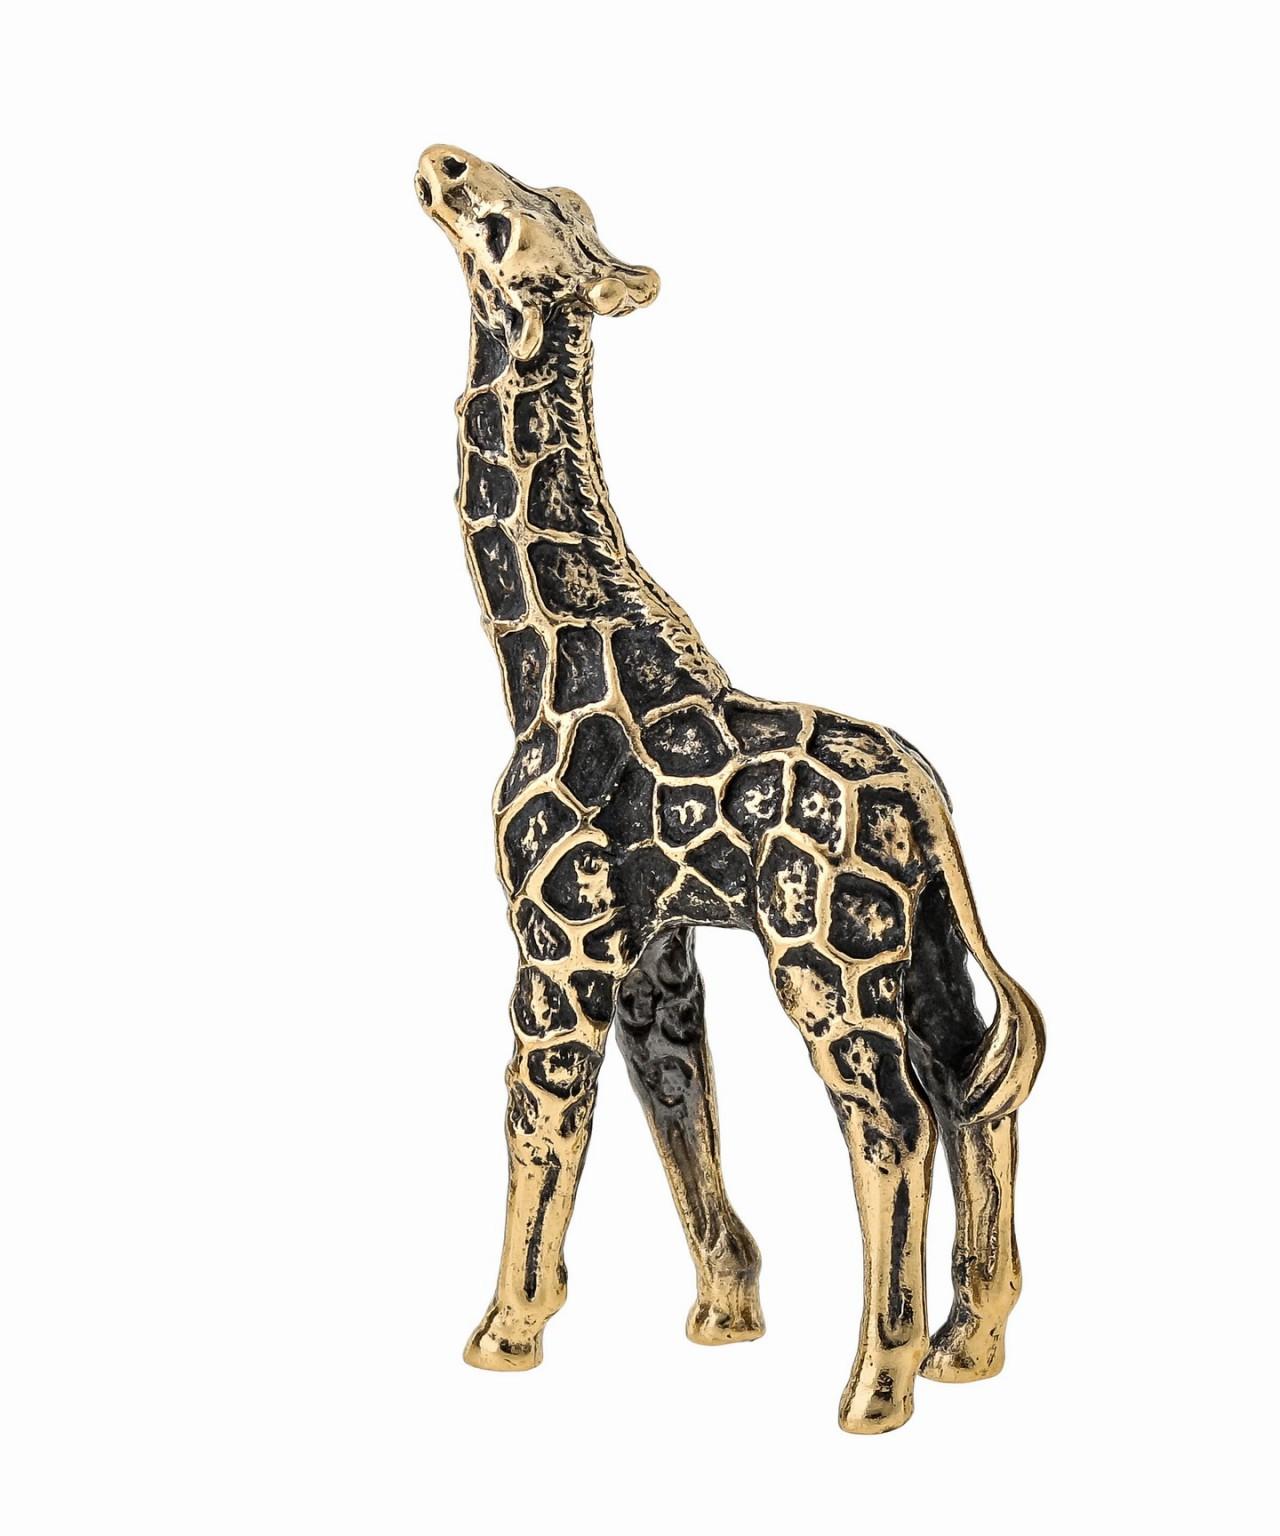 Жирафик Рафик без подставки 1596.1